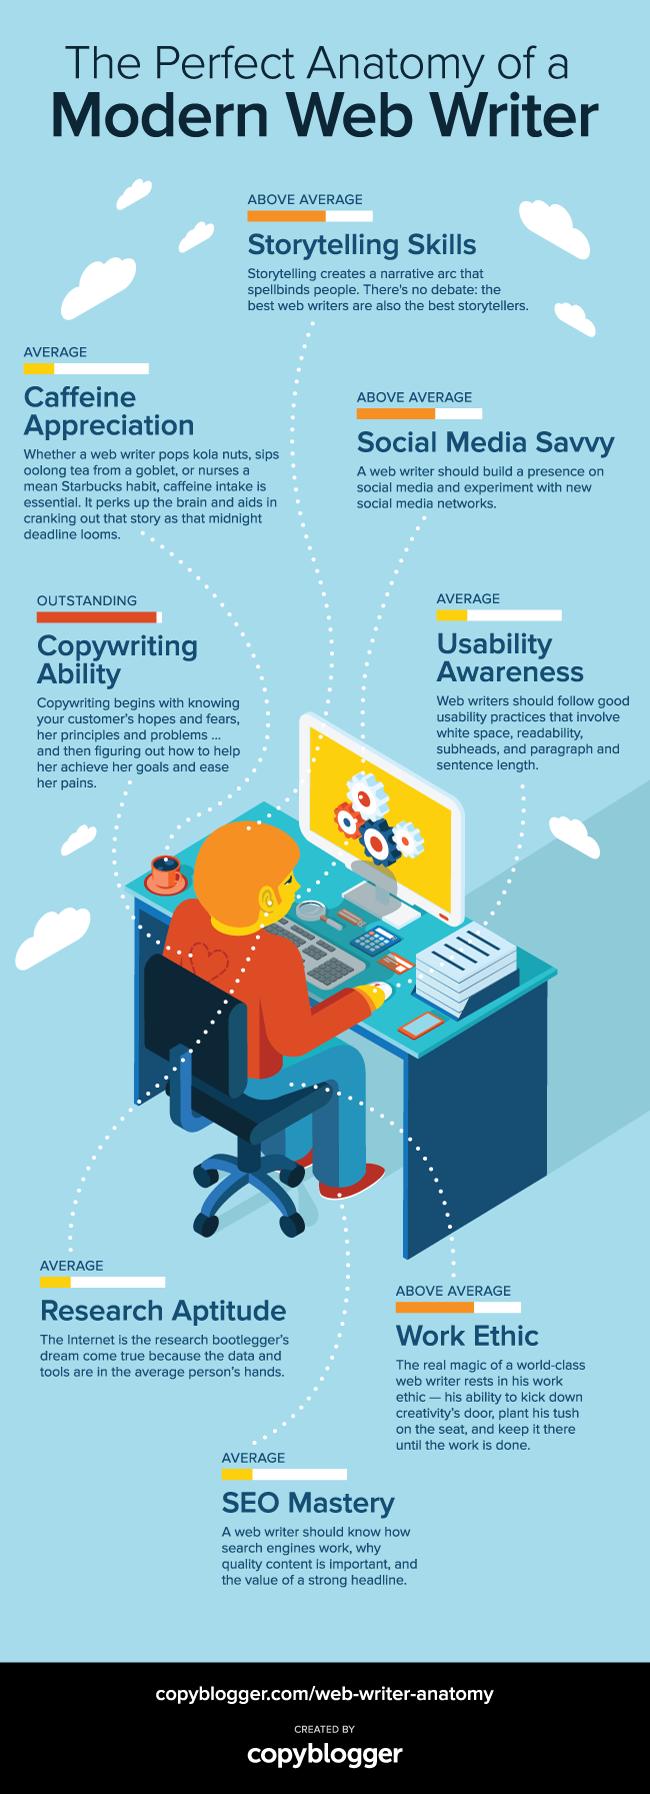 copyblogger-web-writer-anatomy-infographic